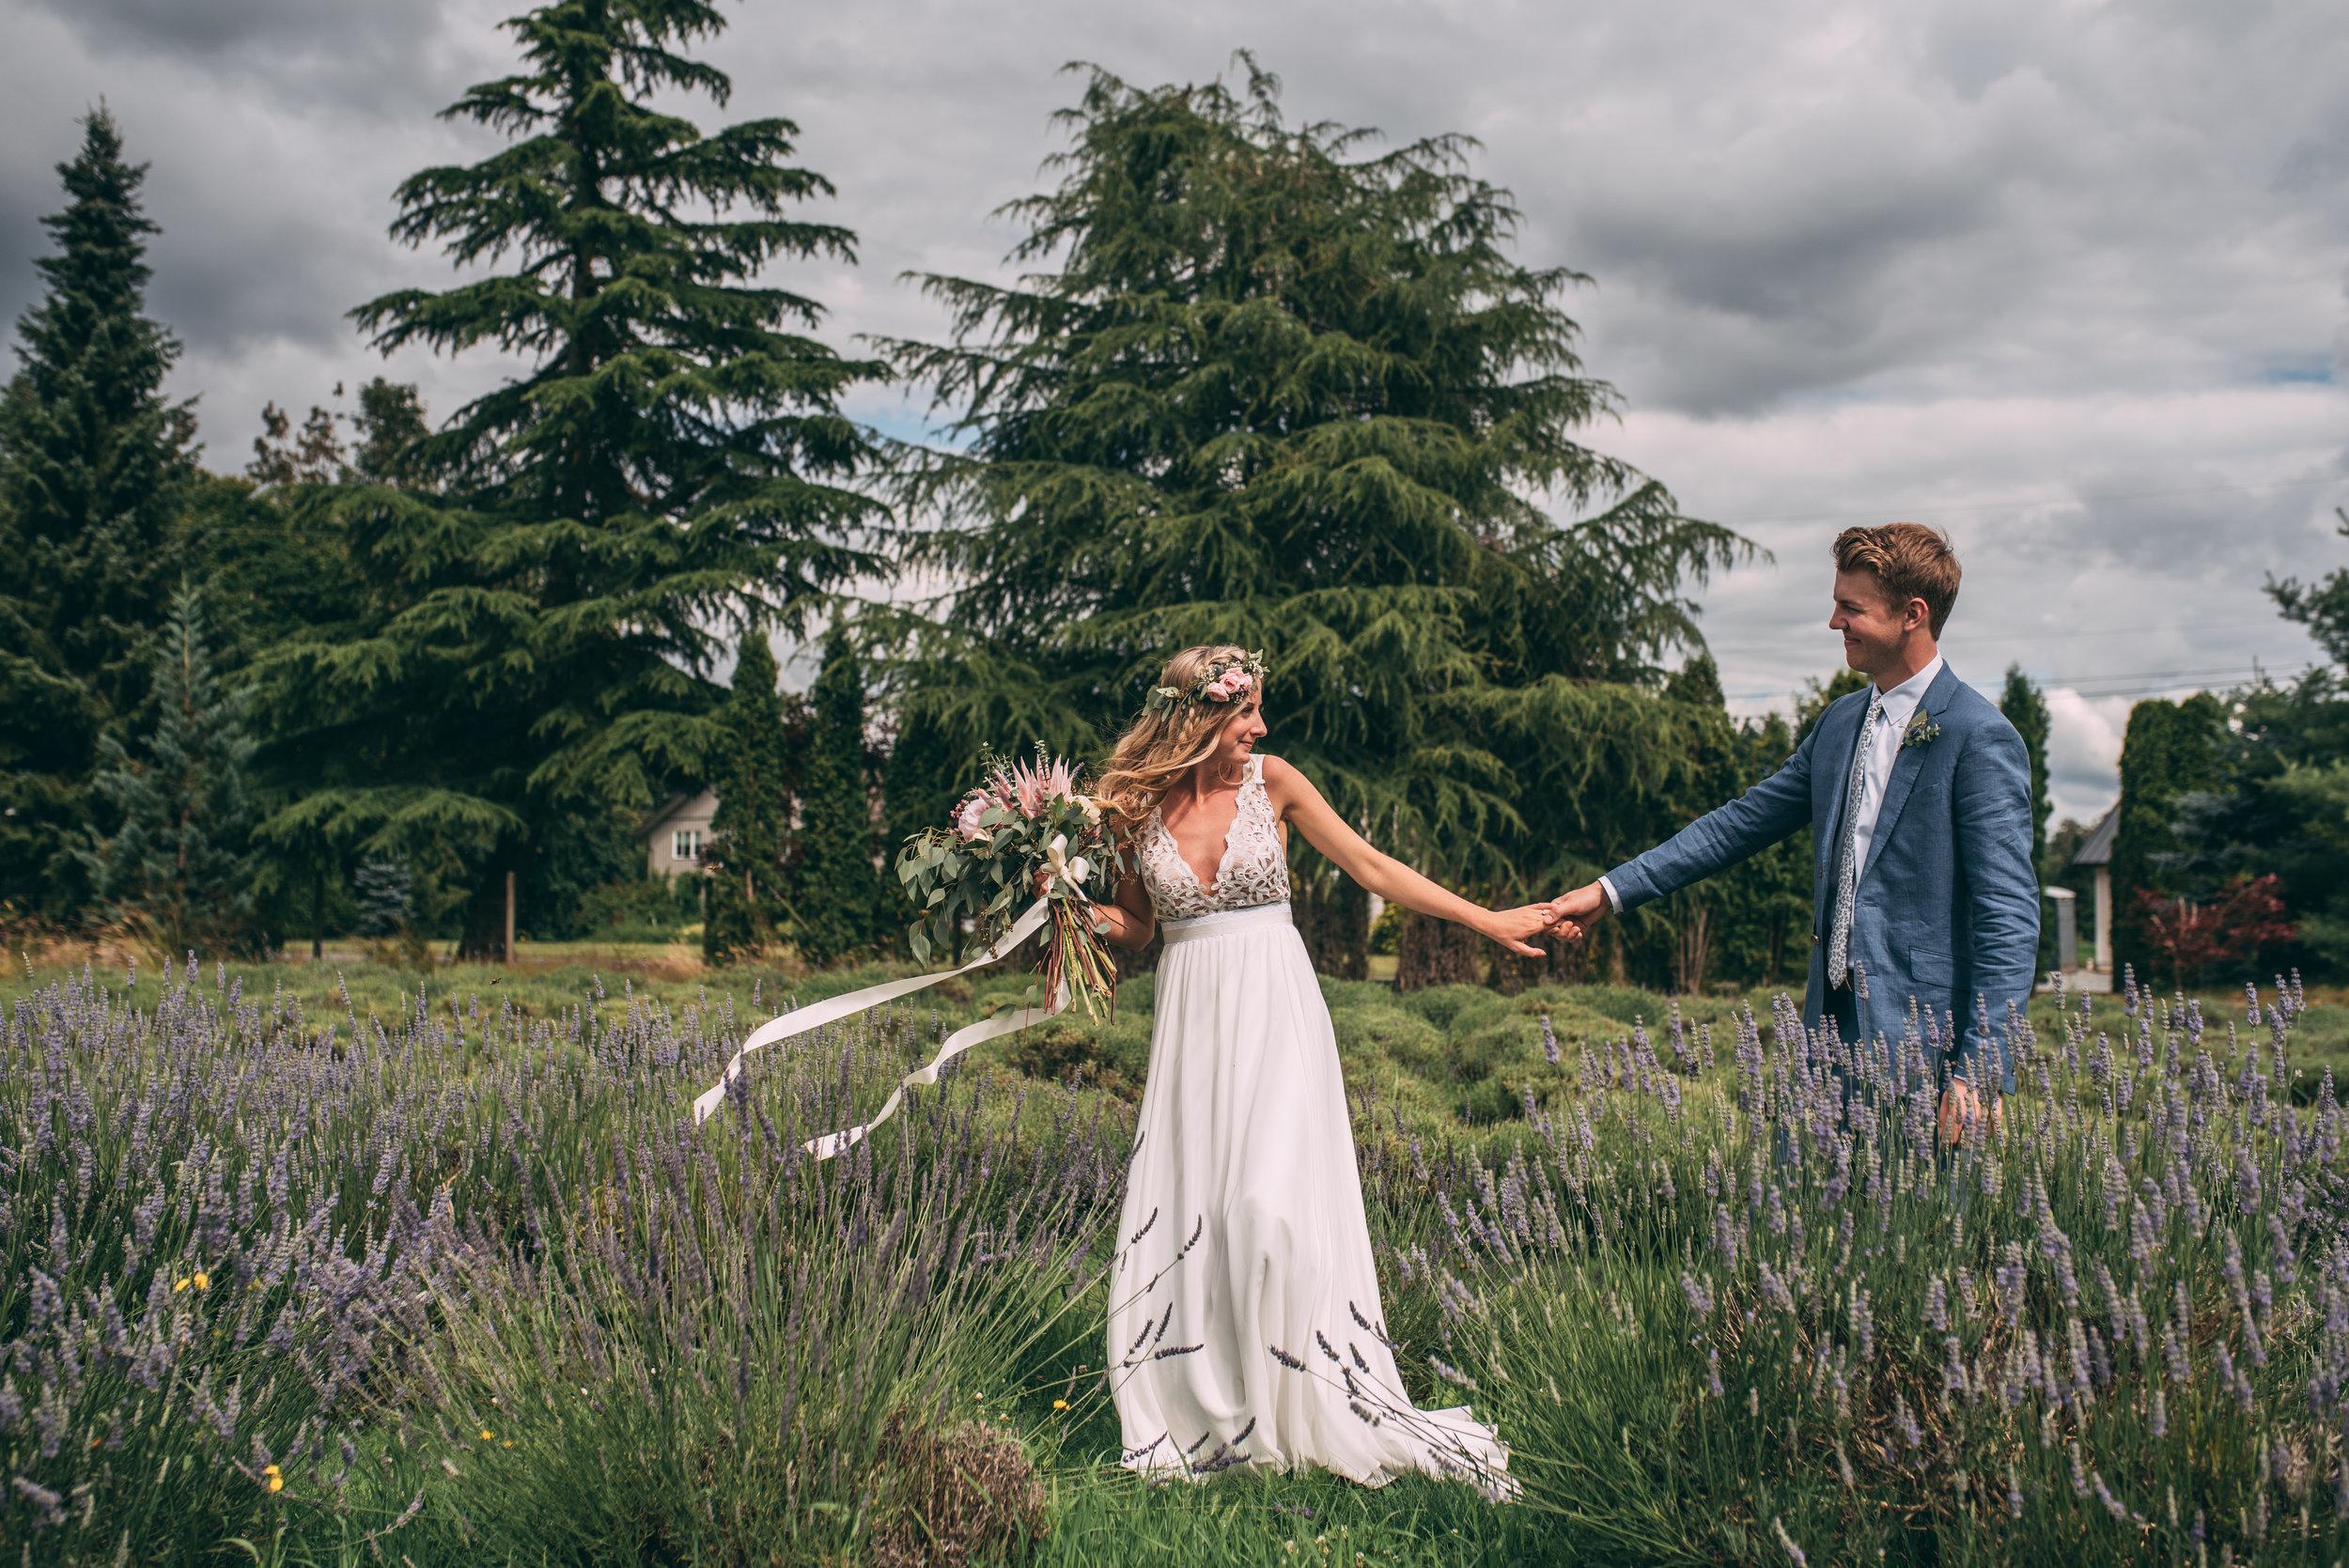 Katie & Cam Wedding - Lavender Farm - July 7, 2018 - Laura Olson Photography - Sunshine Coast Wedding Photographer-5865.jpg